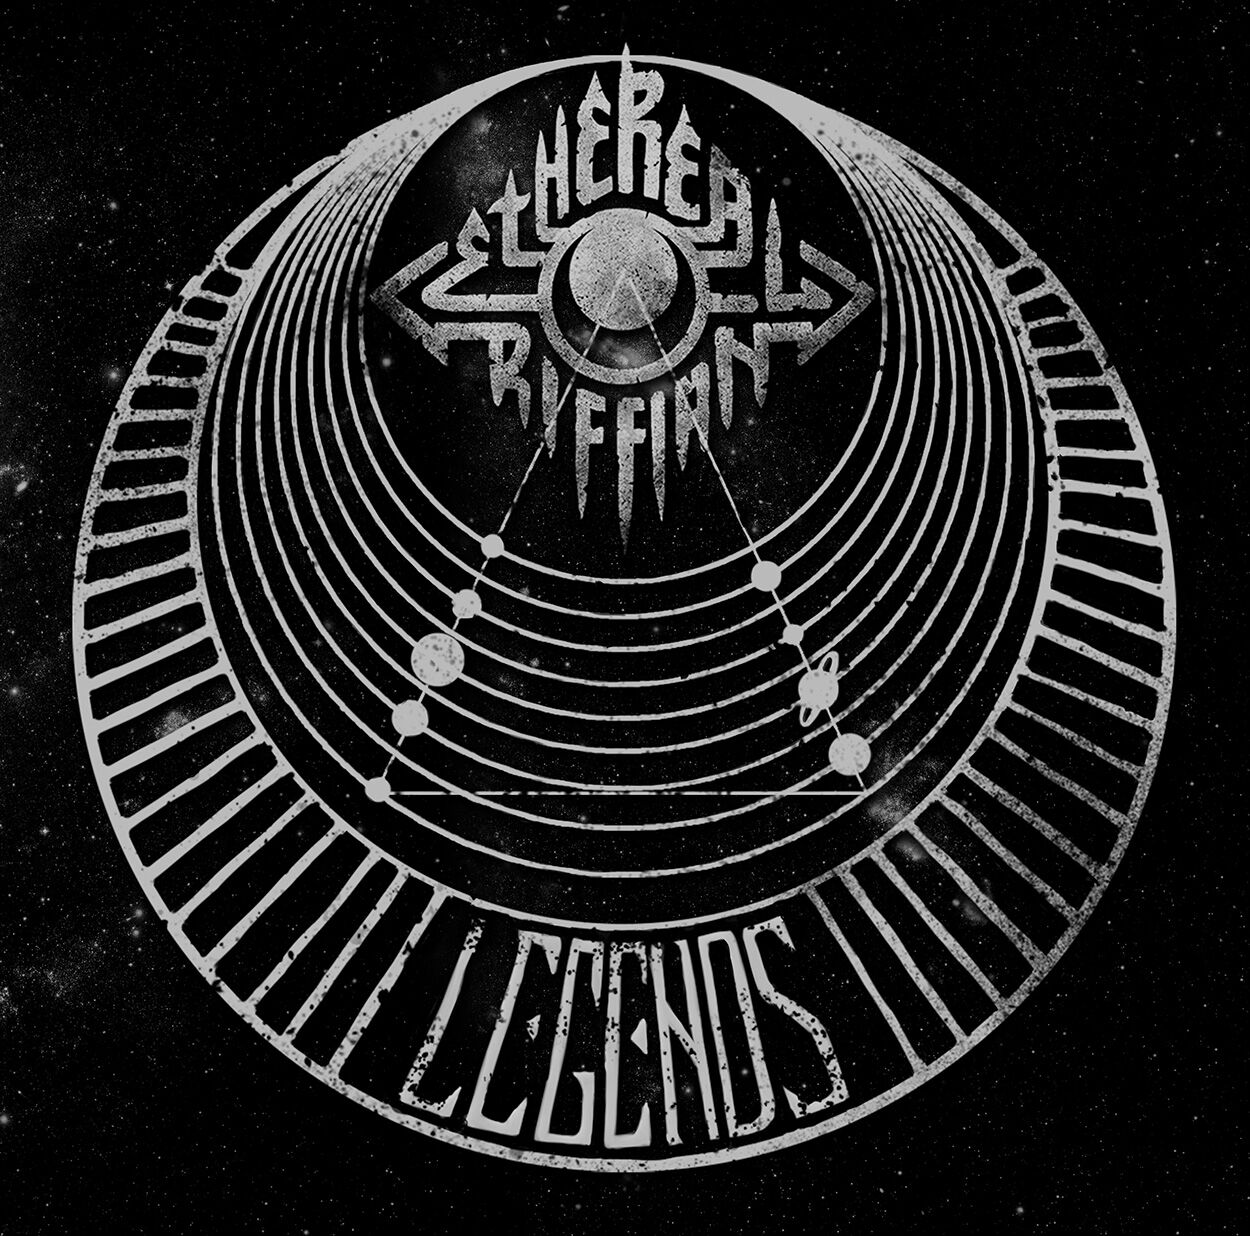 ethereal riffian legends